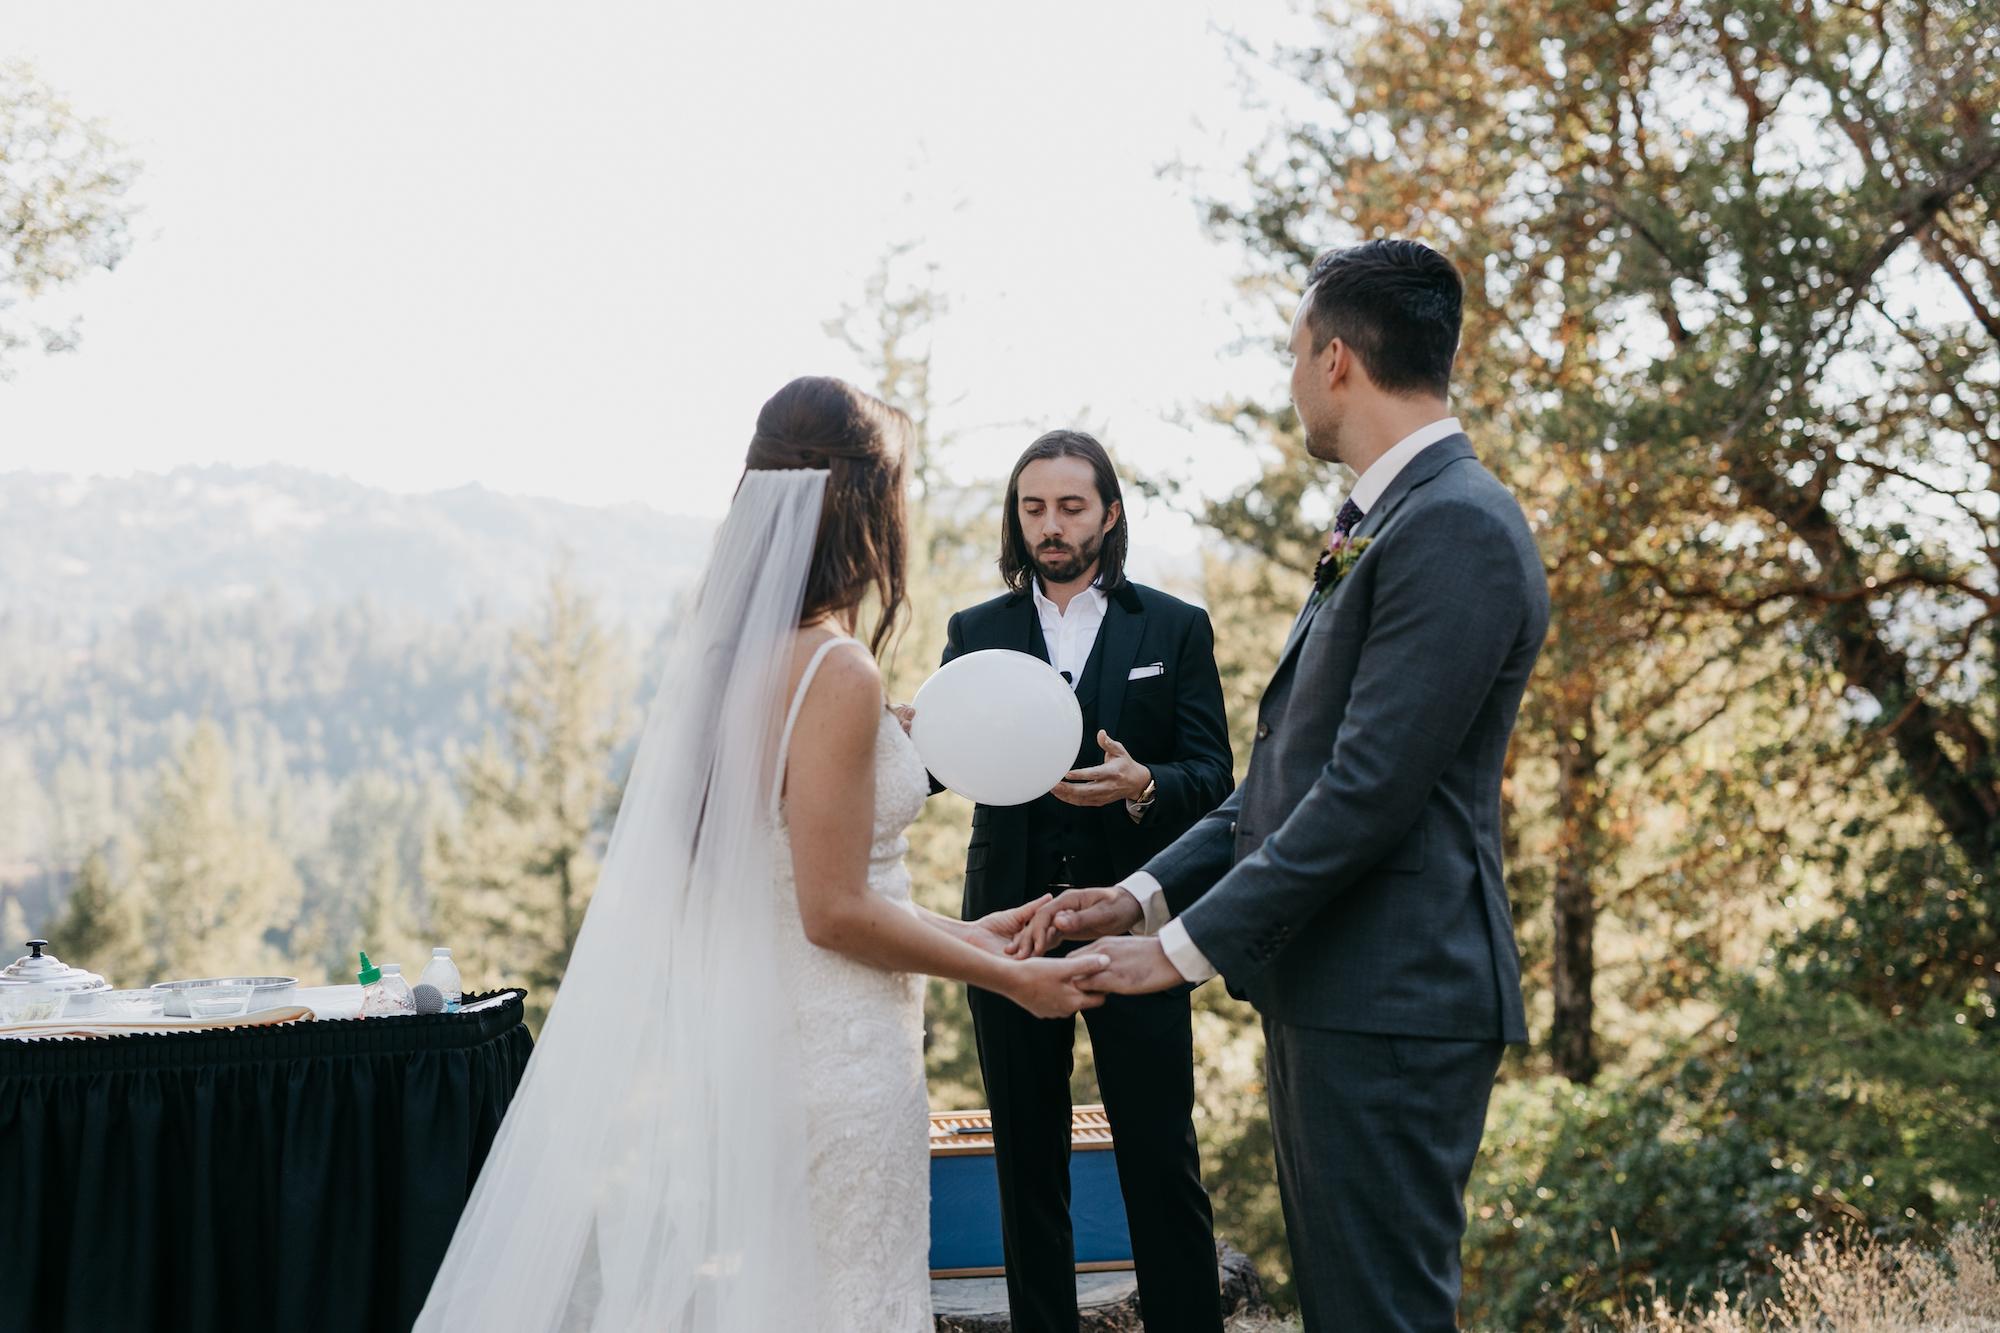 anvil-vineyards-wedding-photographer419.jpg